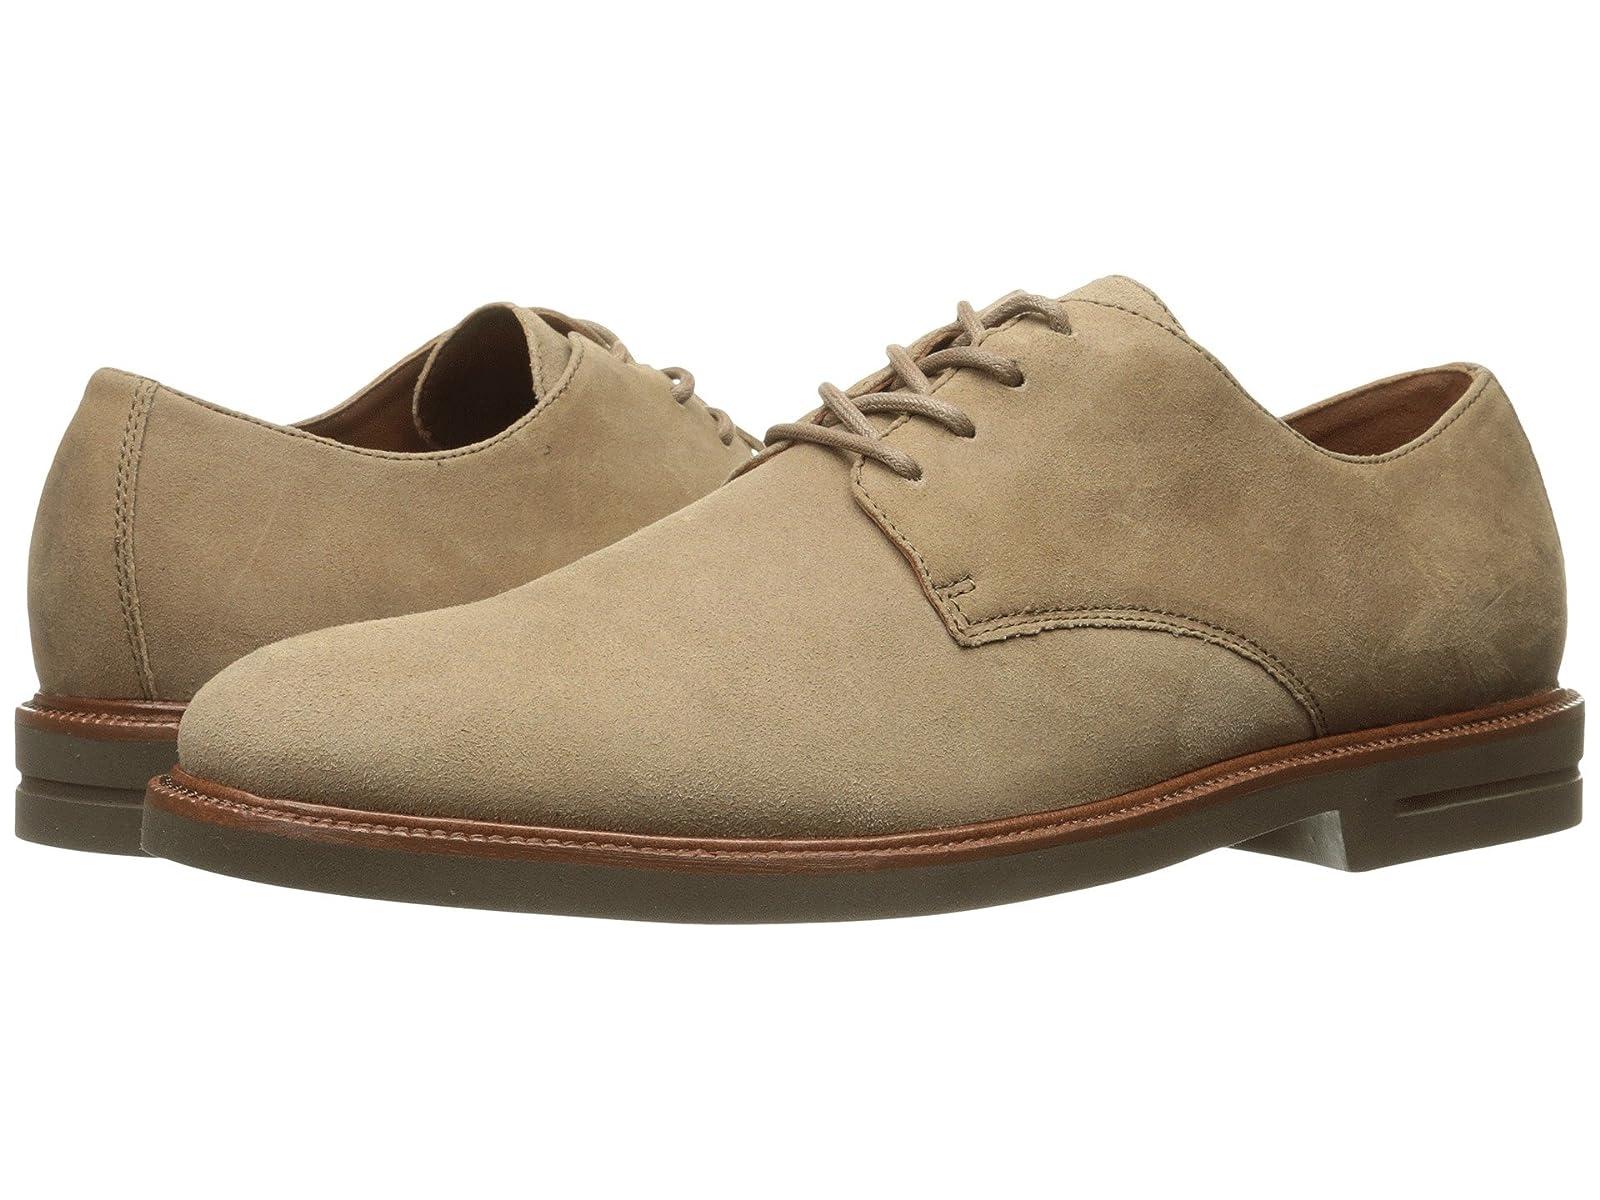 Polo Ralph Lauren TorianCheap and distinctive eye-catching shoes